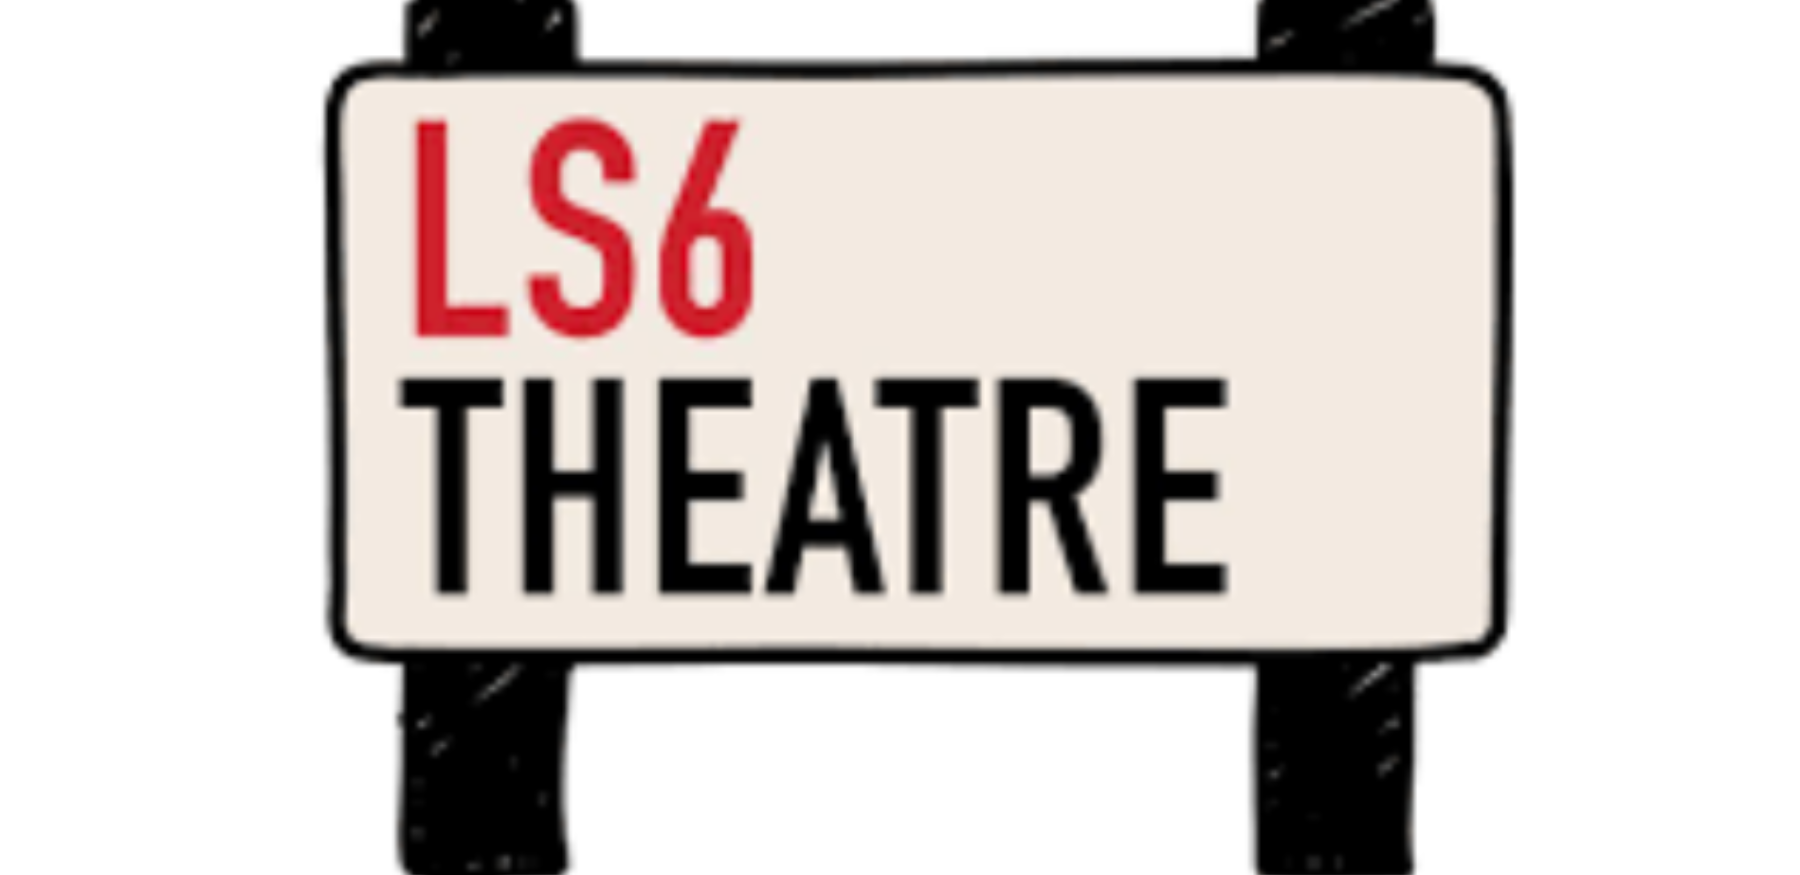 LS6 Theatre